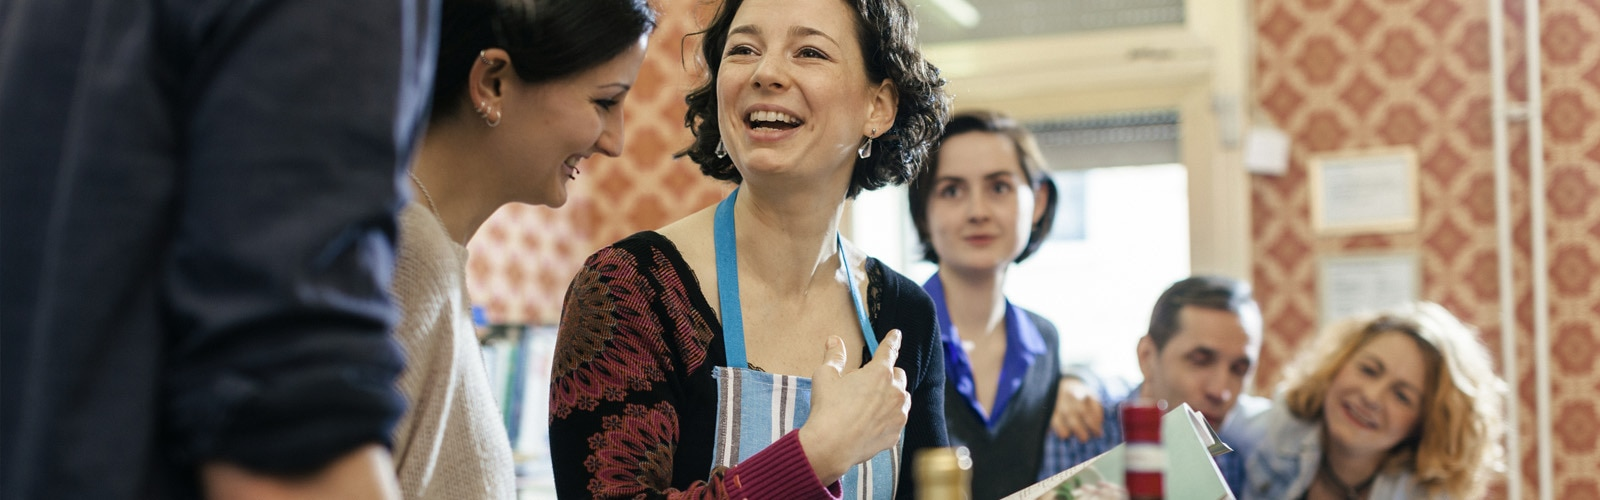 Učiteljica kuhanja je obkrožena z učenci v kuhinji